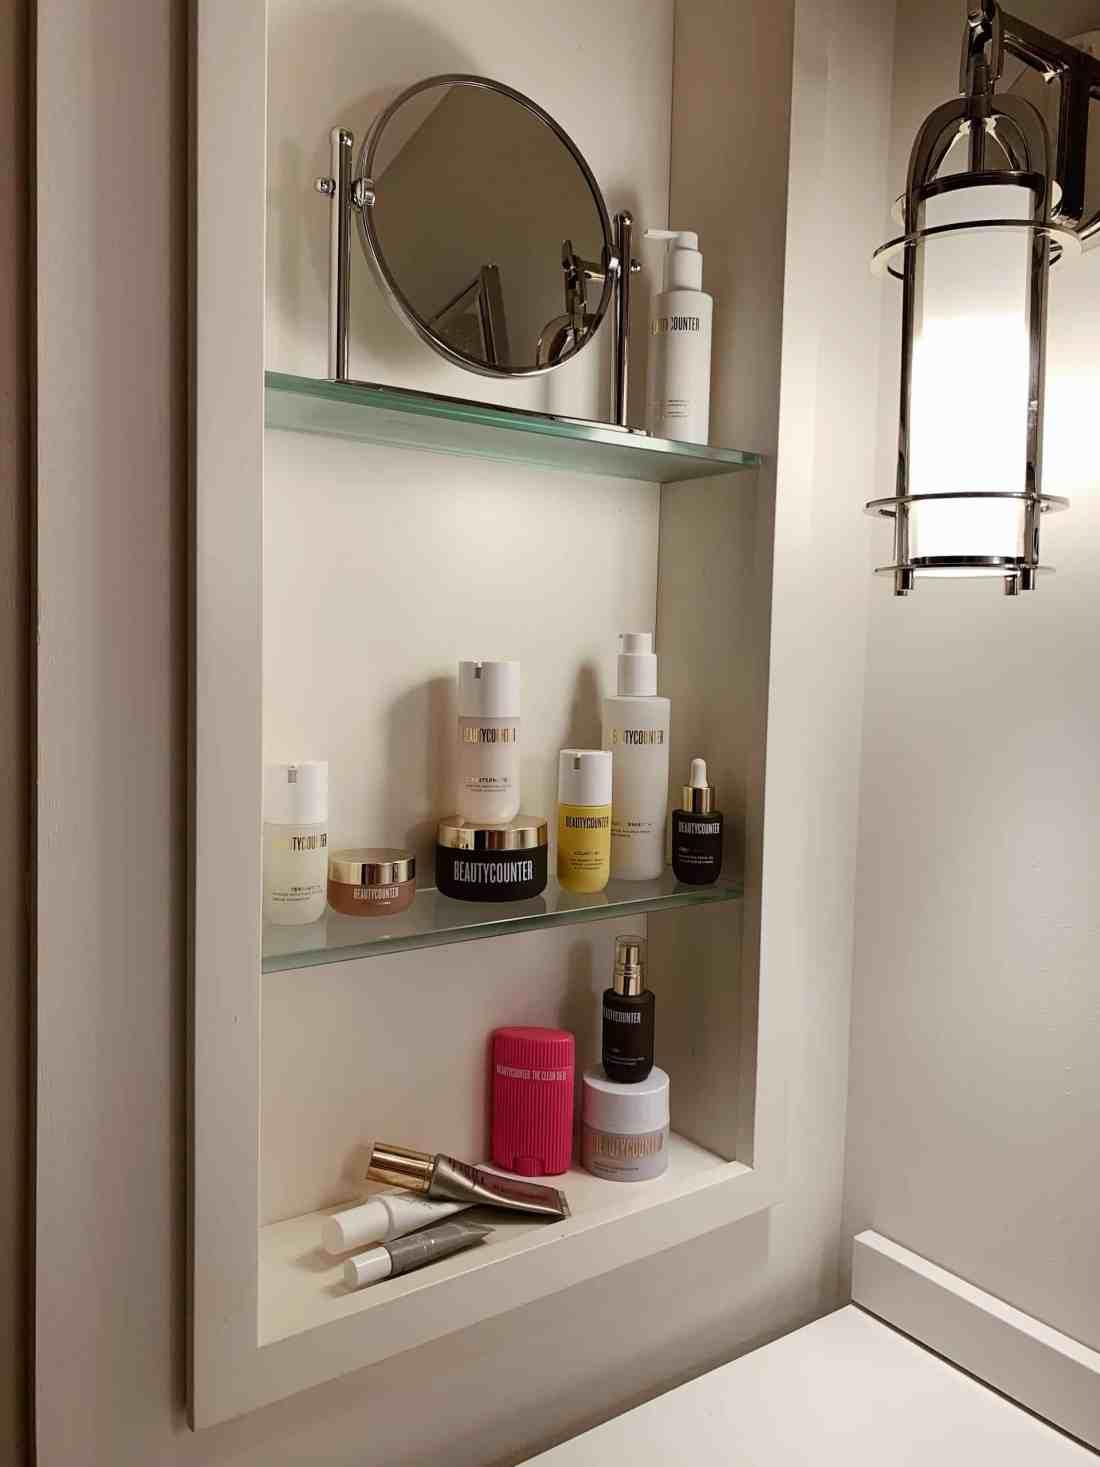 Beautycounter skincare products on a shelf